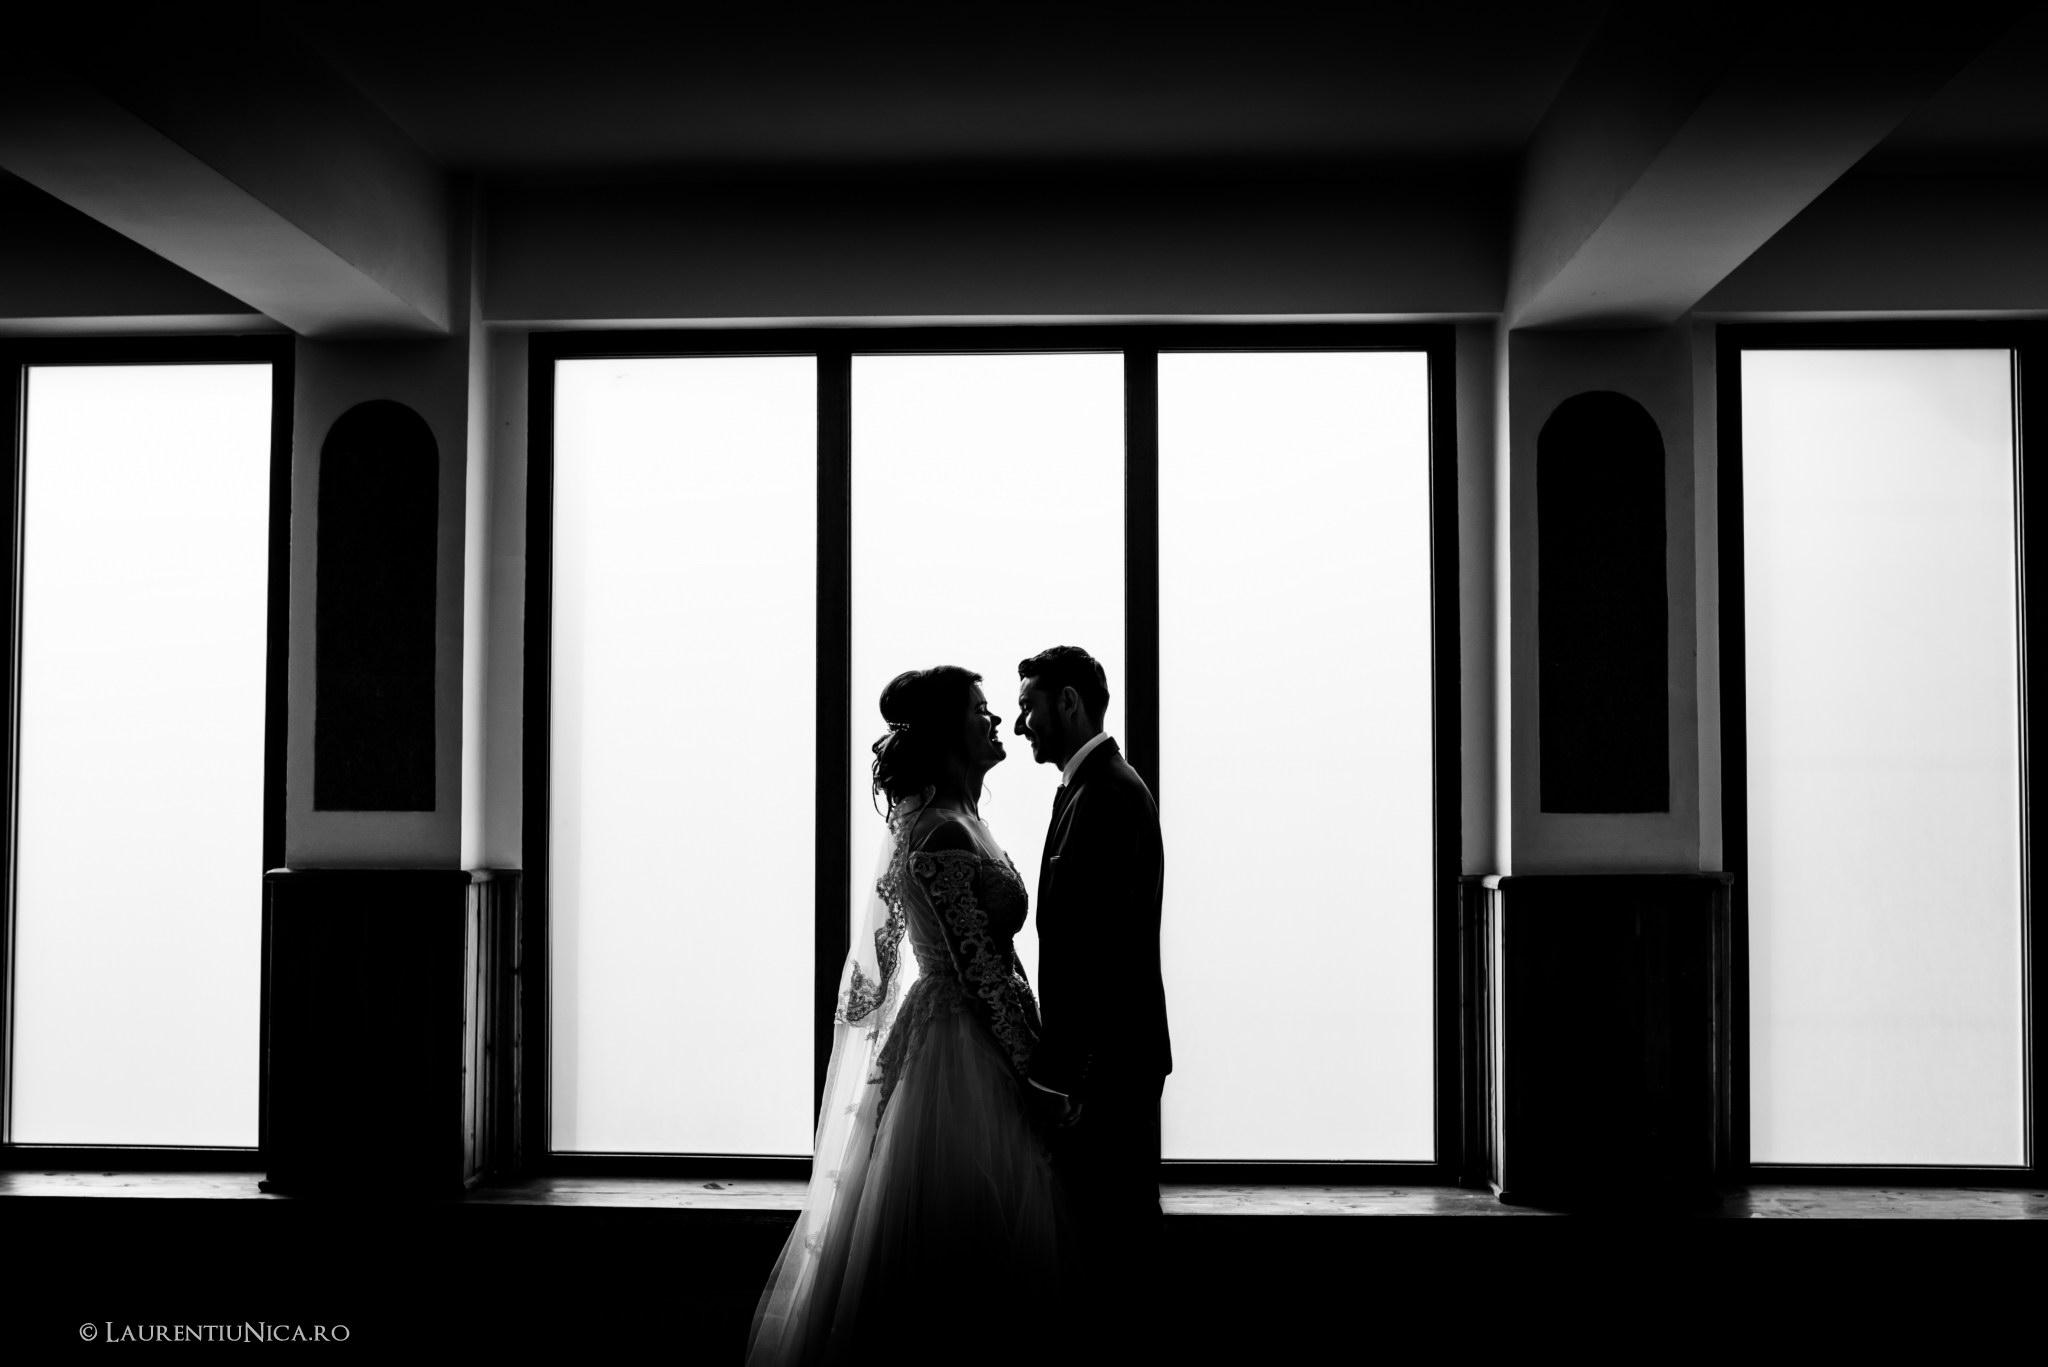 Alina si Andrei fotograf nunta laurentiu nica craiova 30 - Alina & Andrei | Fotografii nunta